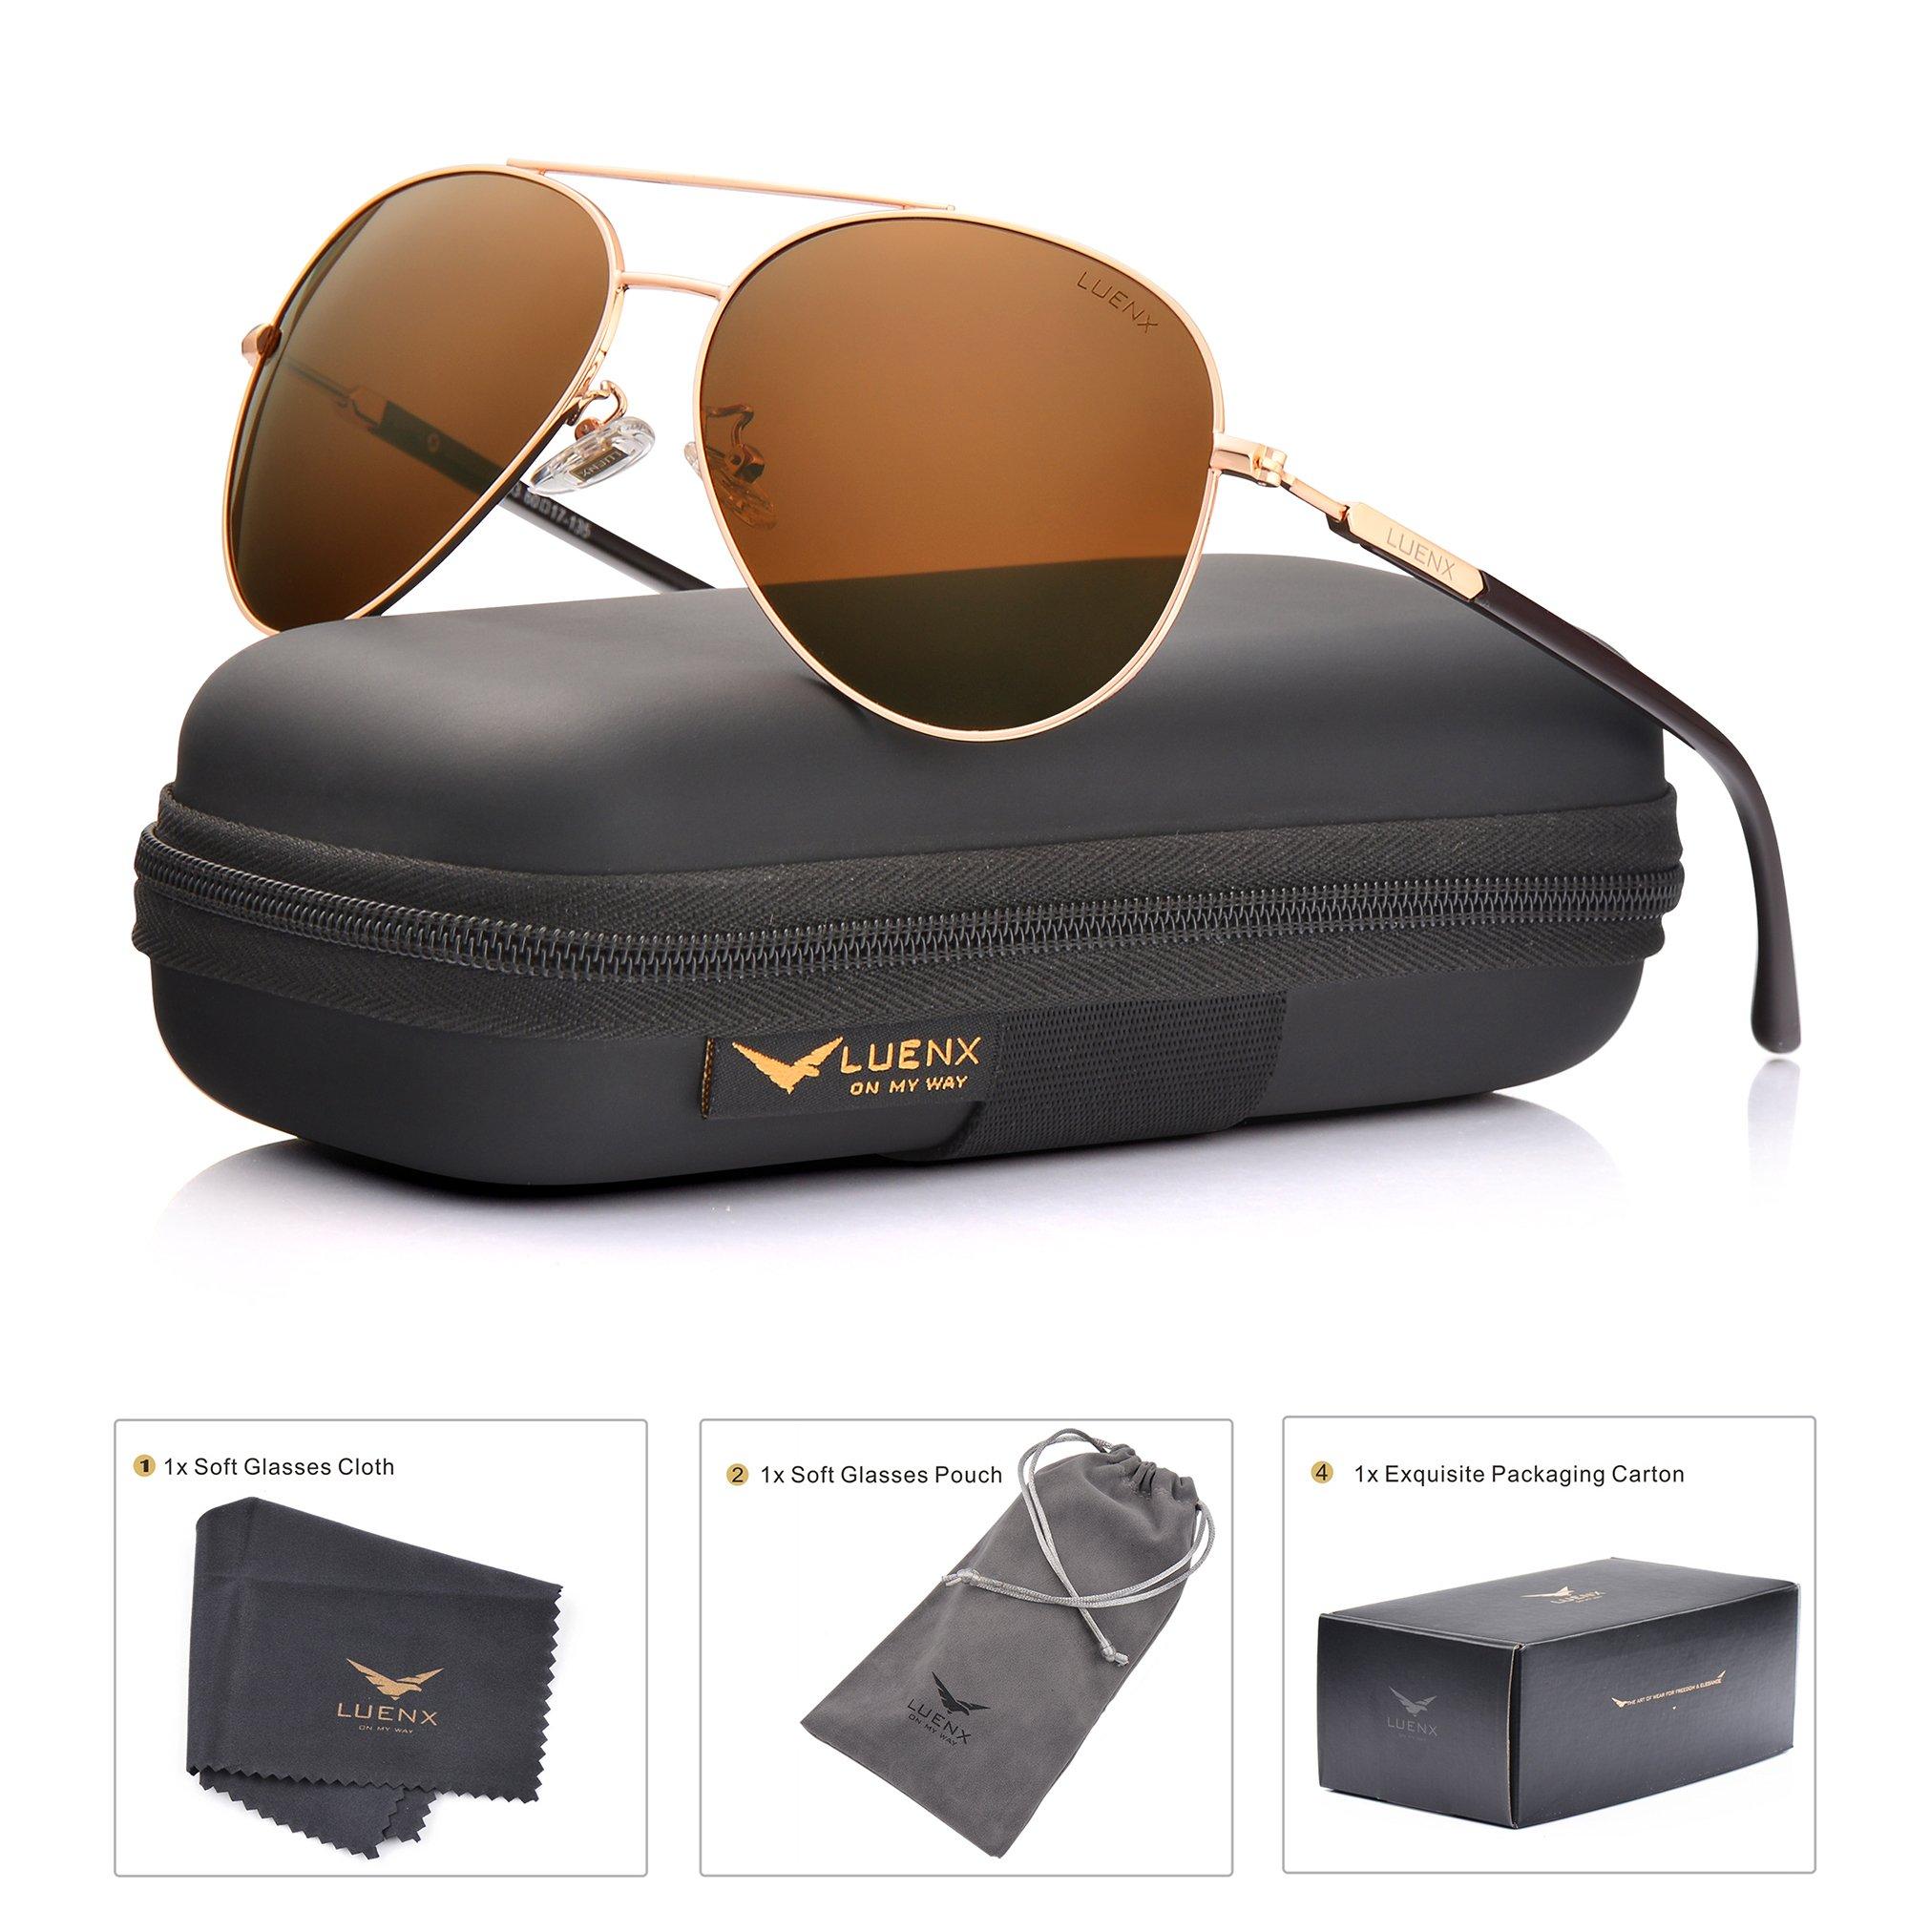 LUENX Aviator Sunglasses Mens Womens Polarized Brown Plastic Lens Gold Metal Frame Large 60mm